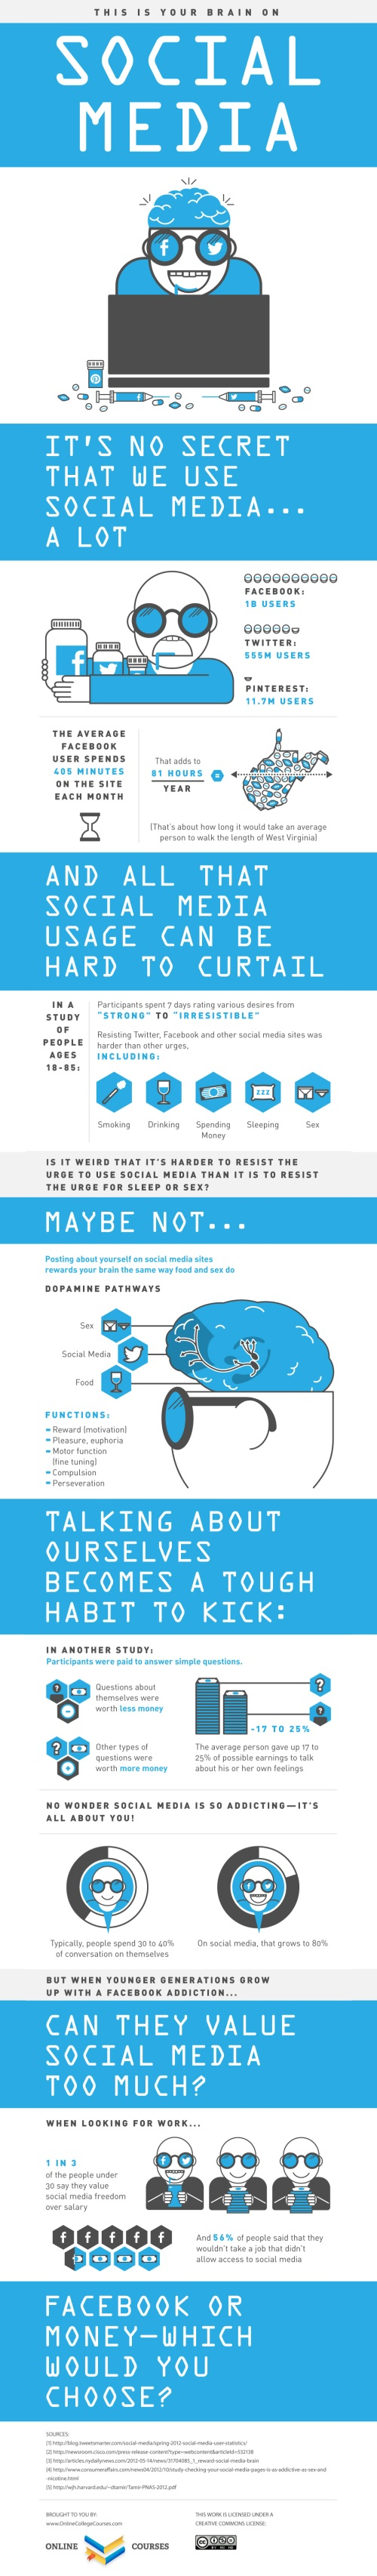 Social-Media-Brain-Infographic